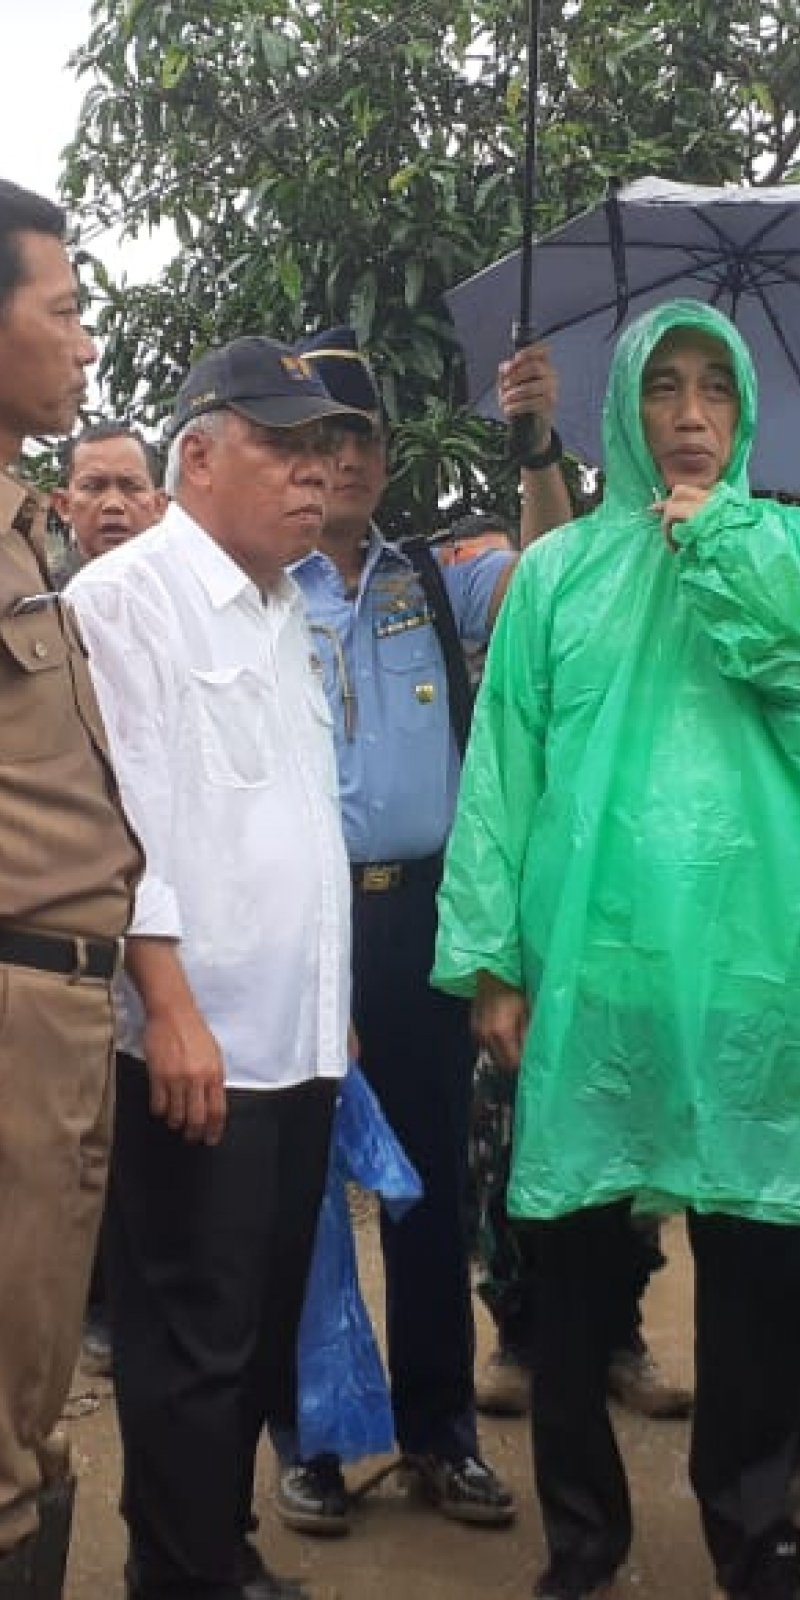 Monyet Pakai Jas Hujan : monyet, pakai, hujan, Hujan, Plastik, Dikenakan, Jokowi, Praktis, Harga, Hanya, Rp10.000, ANTARA, Barat